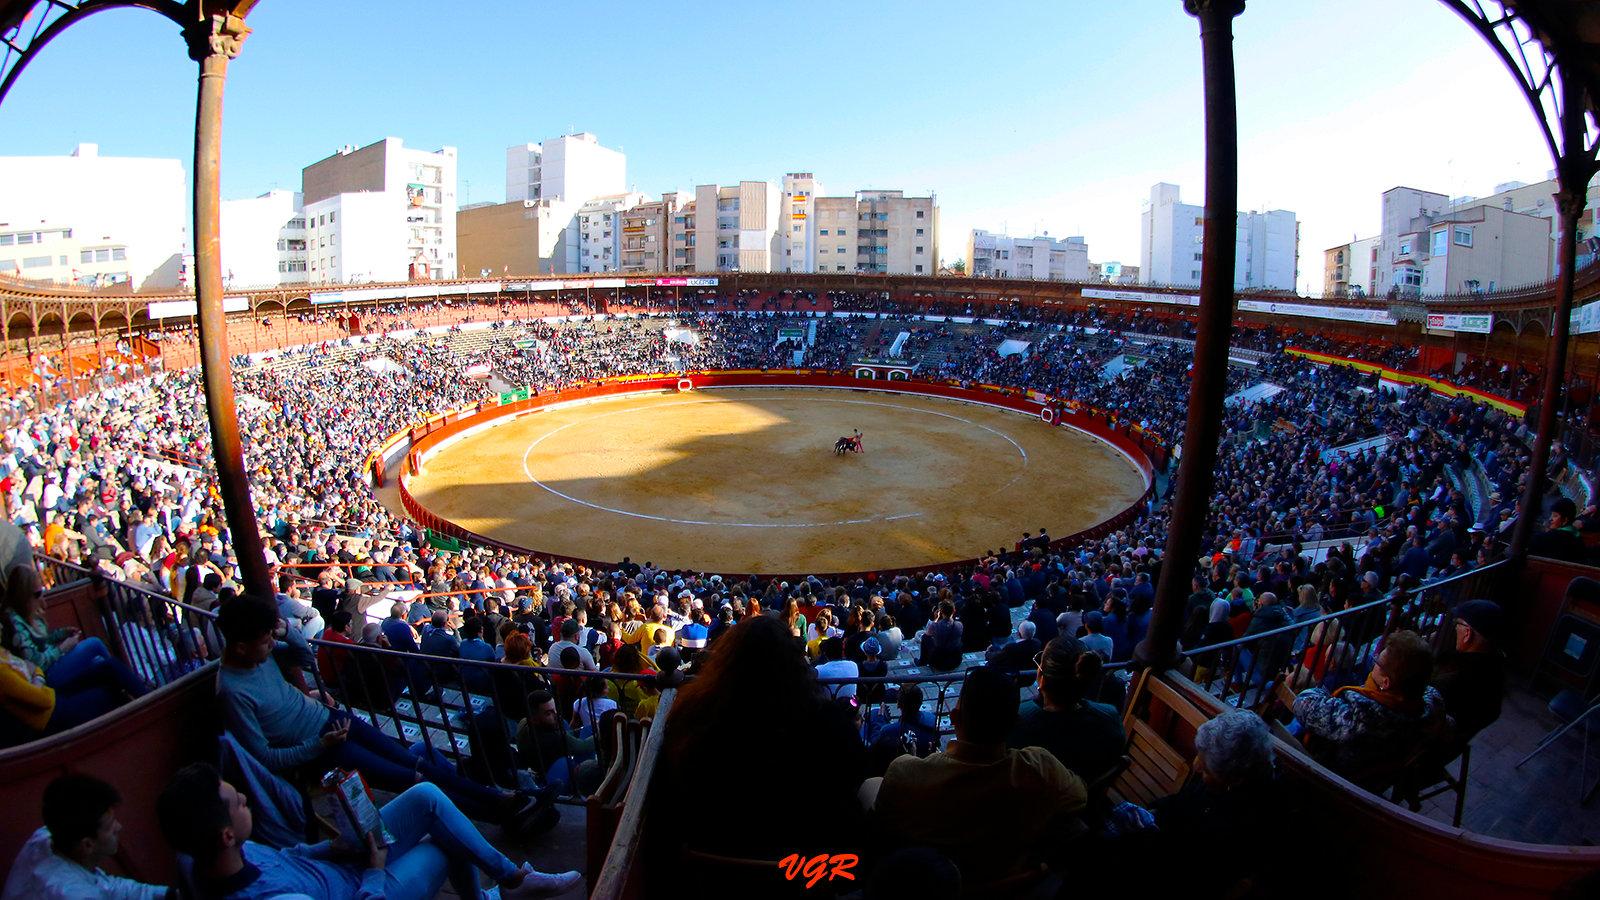 Plaza de toros-3b-WEB.jpg